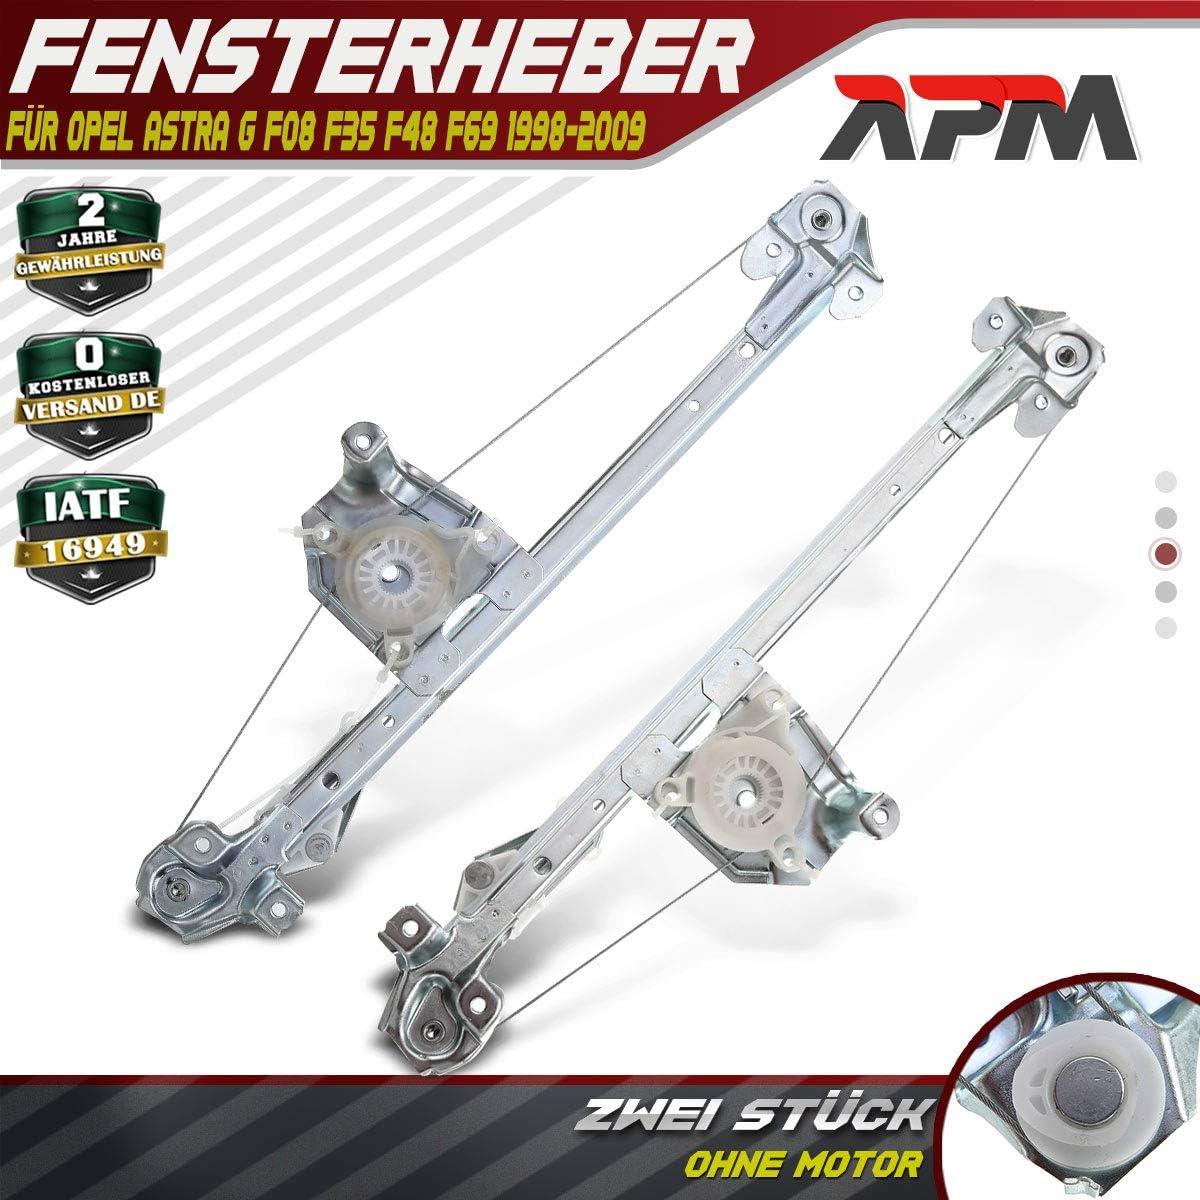 Frankberg 2X Fensterheber Ohne Motor Hinten Links und Rechts f/ür Astra G CC Caravan Stufenheck F48/_ F08/_ F35/_ F69/_ 1998-2009 5140015